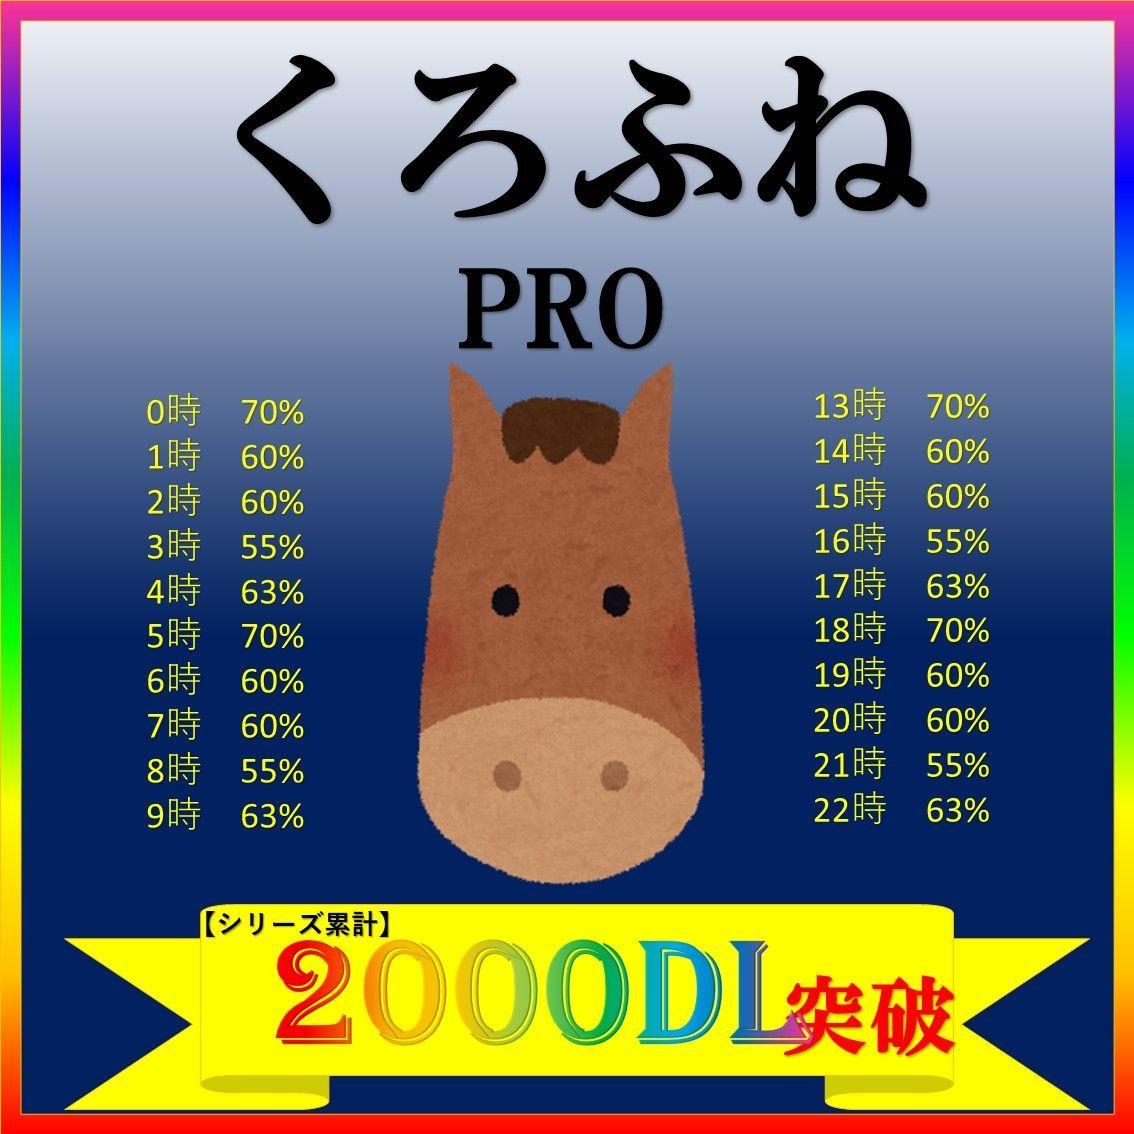 【異国のRSI購入者限定】KUROHUNE PRO